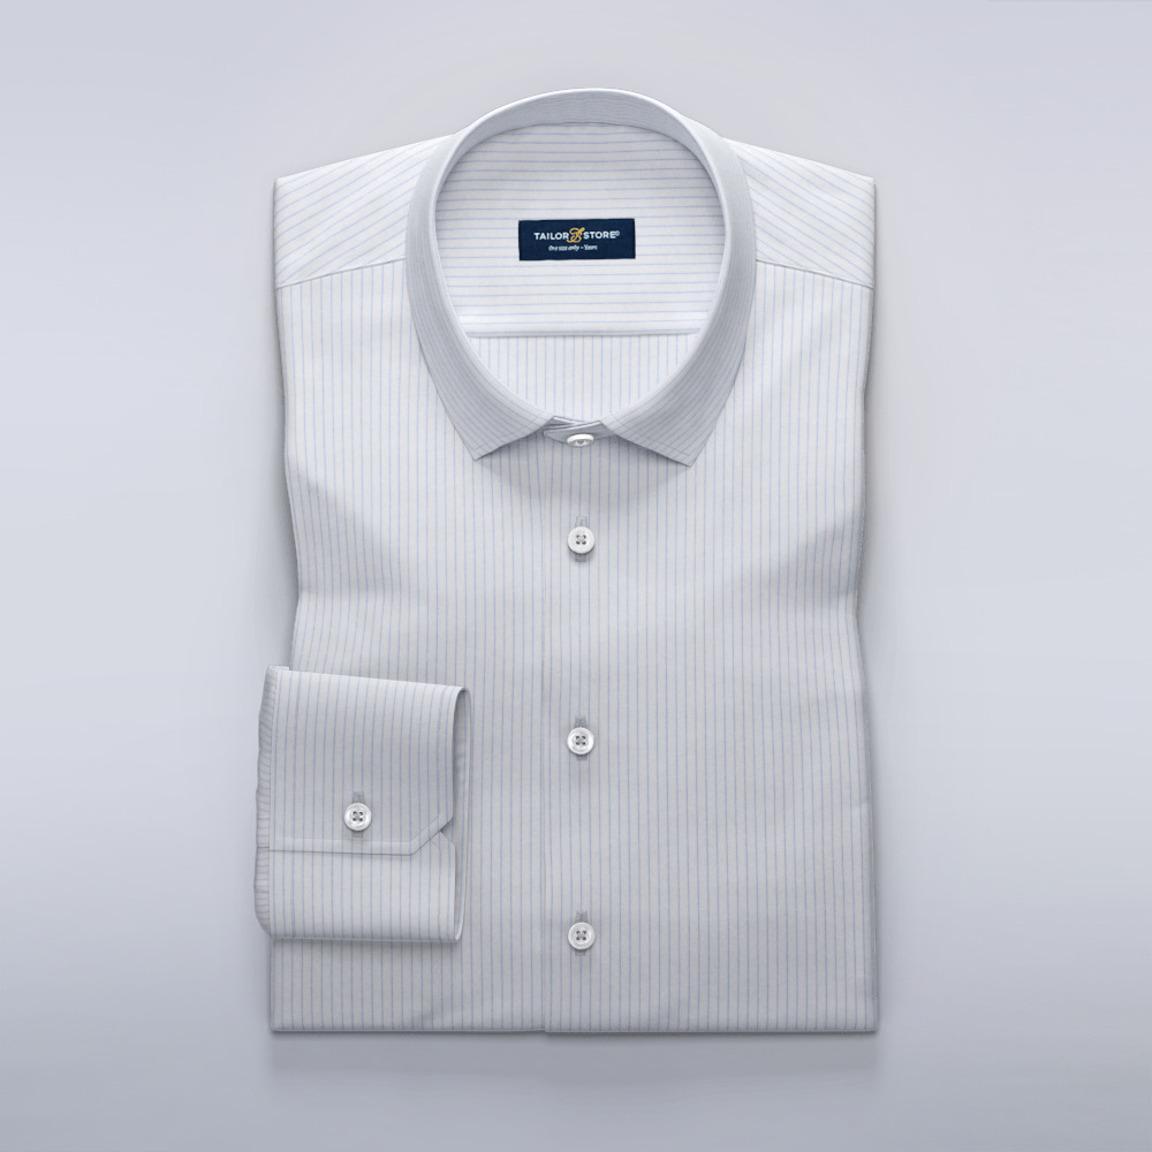 Business-skjorte med tynde, lyseblå striber